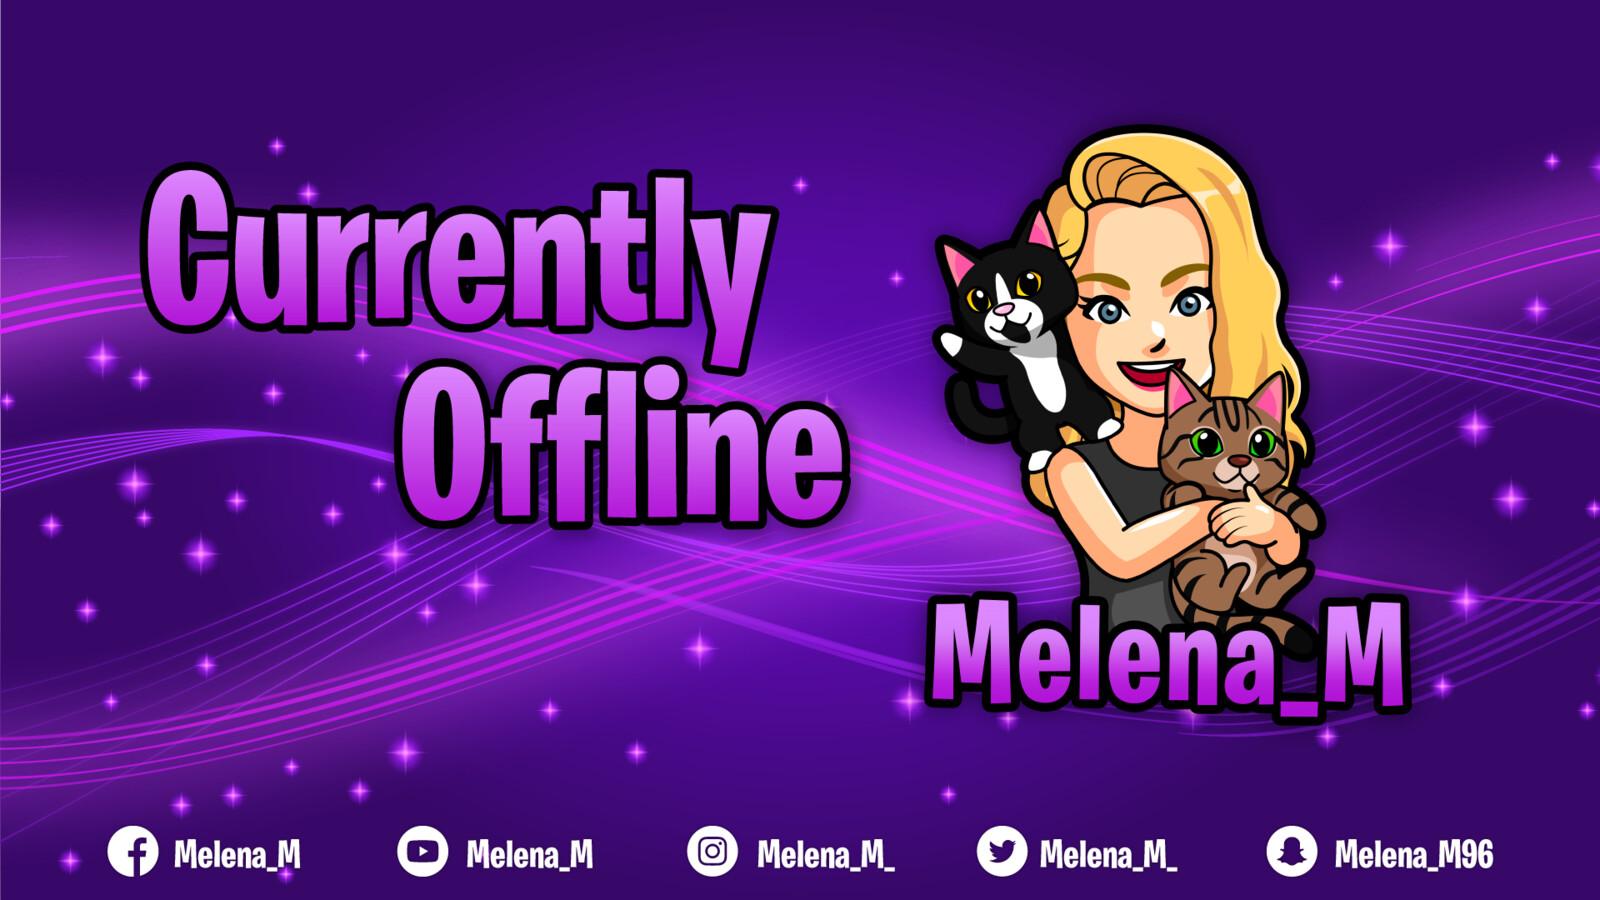 Melena_M